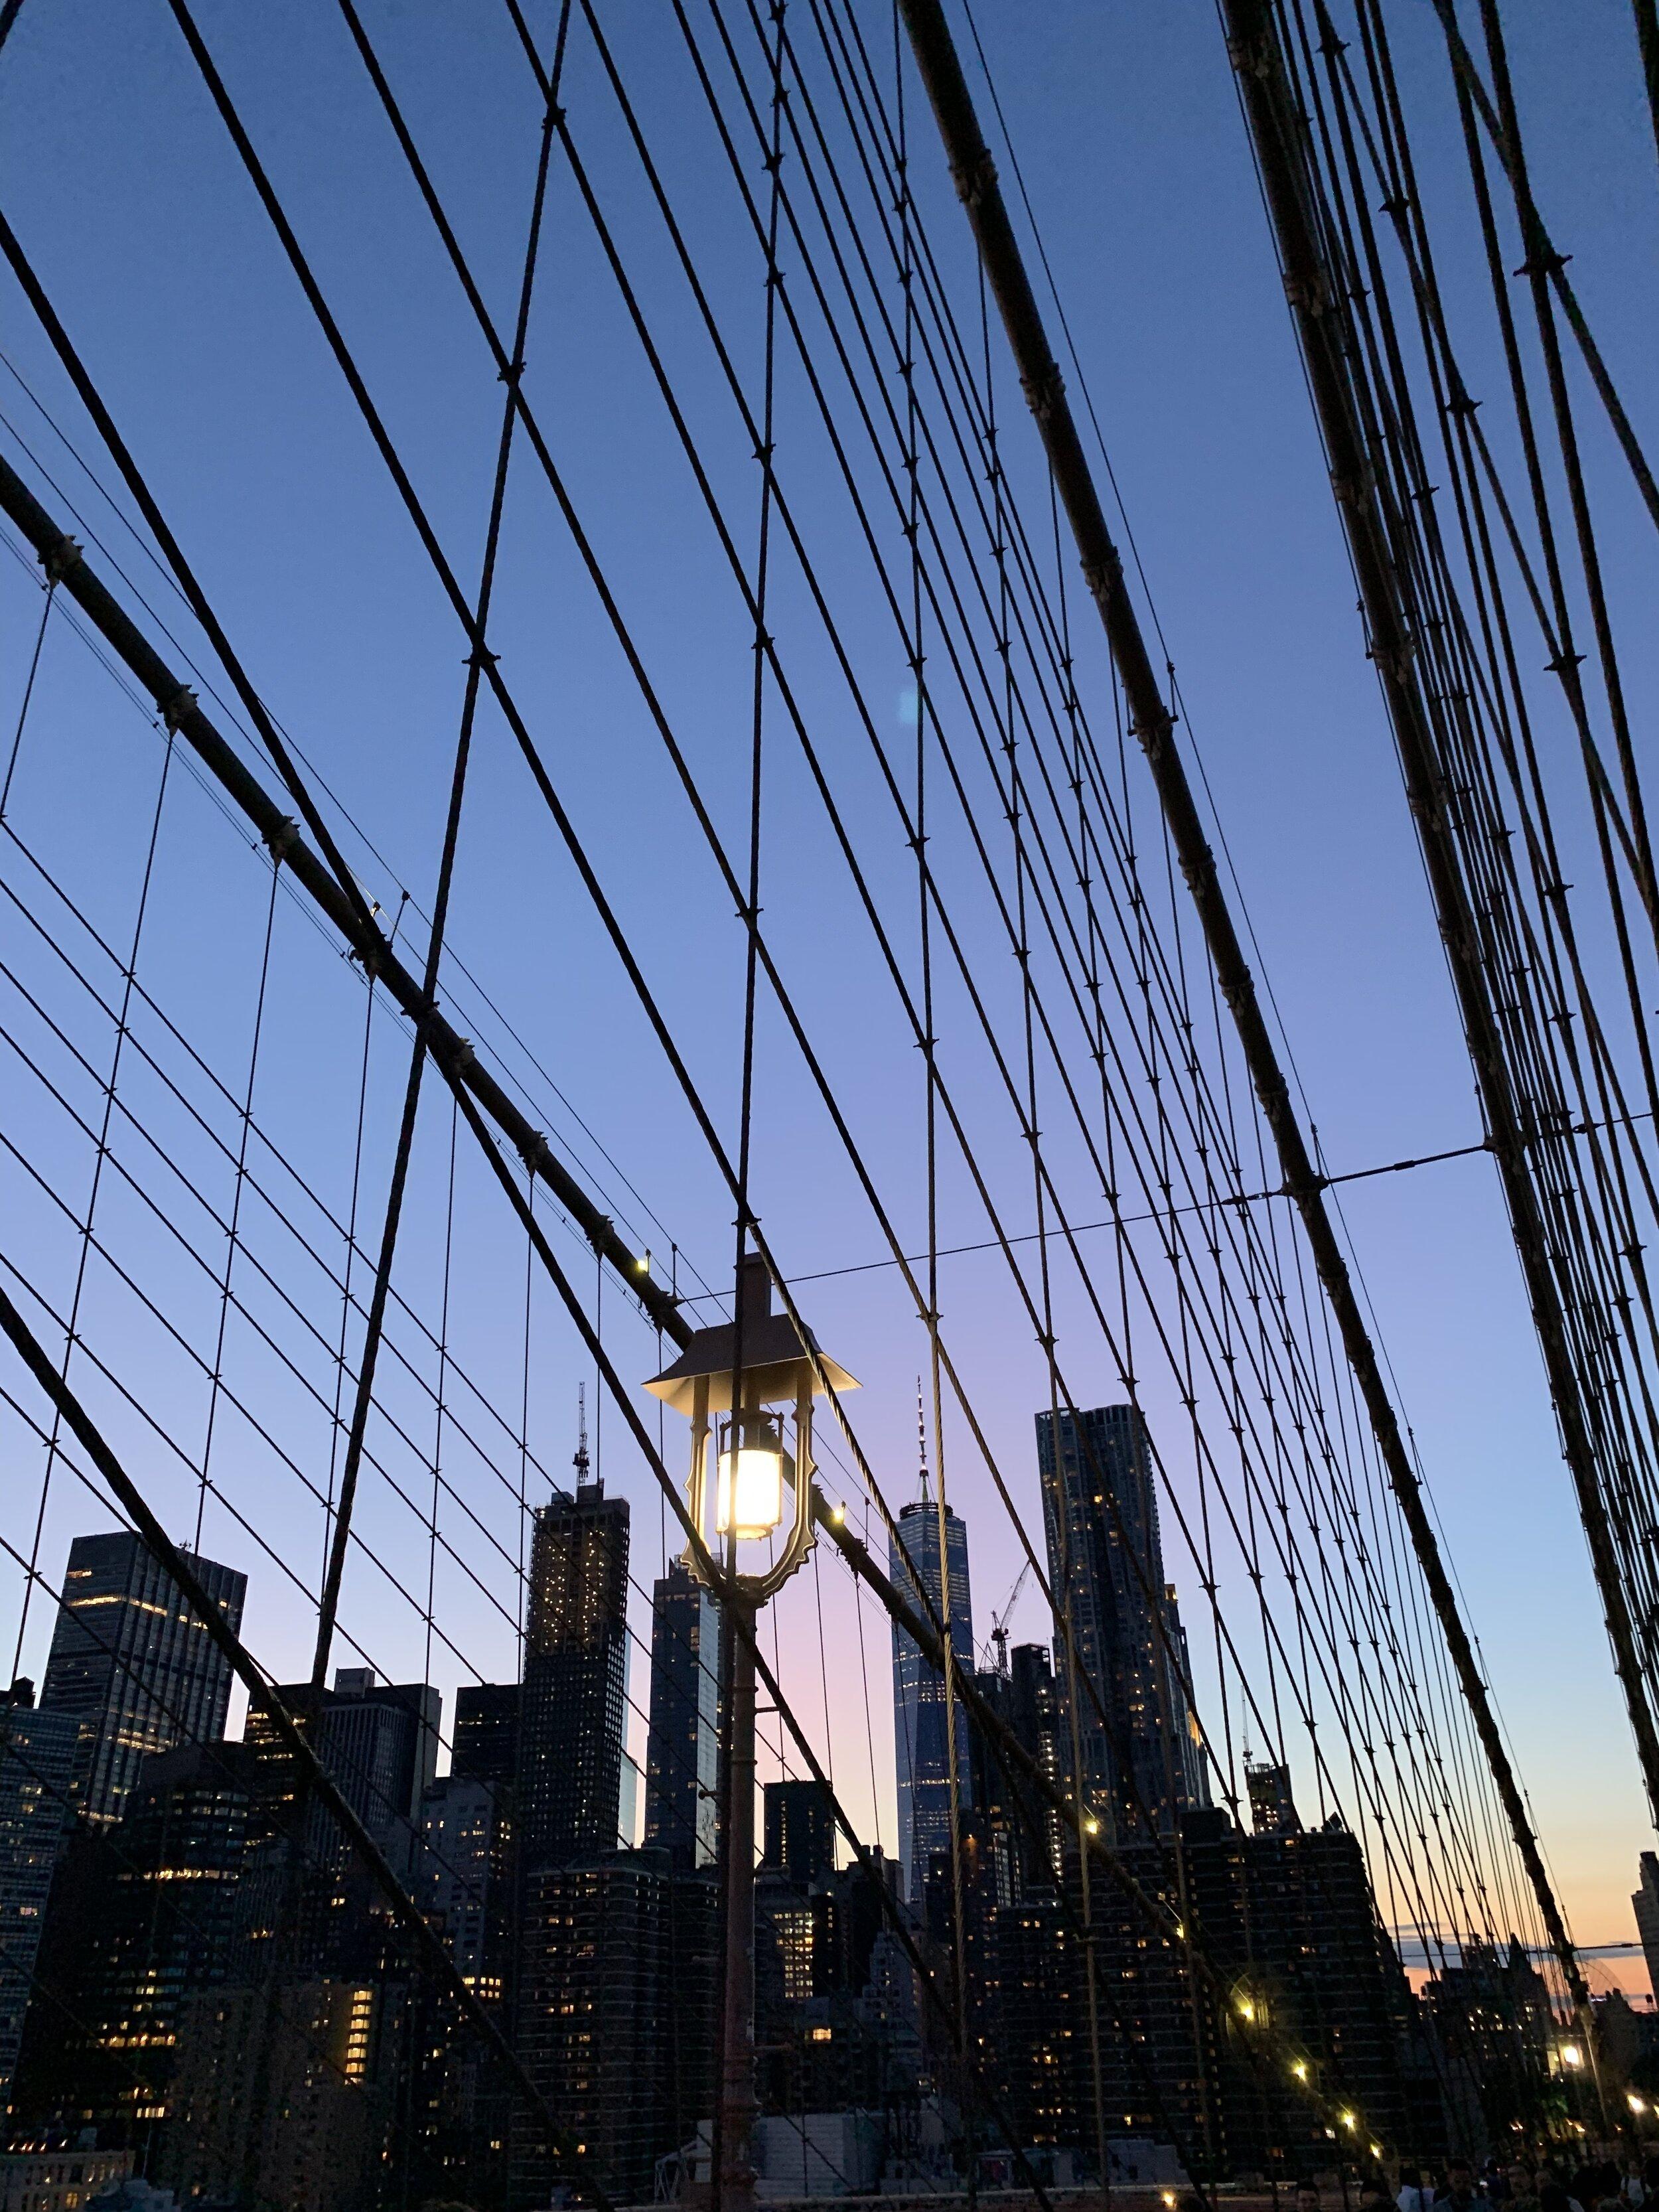 bresheppard.com : NYFW 2019 Brooklyn Bridge at Sunset.jpg